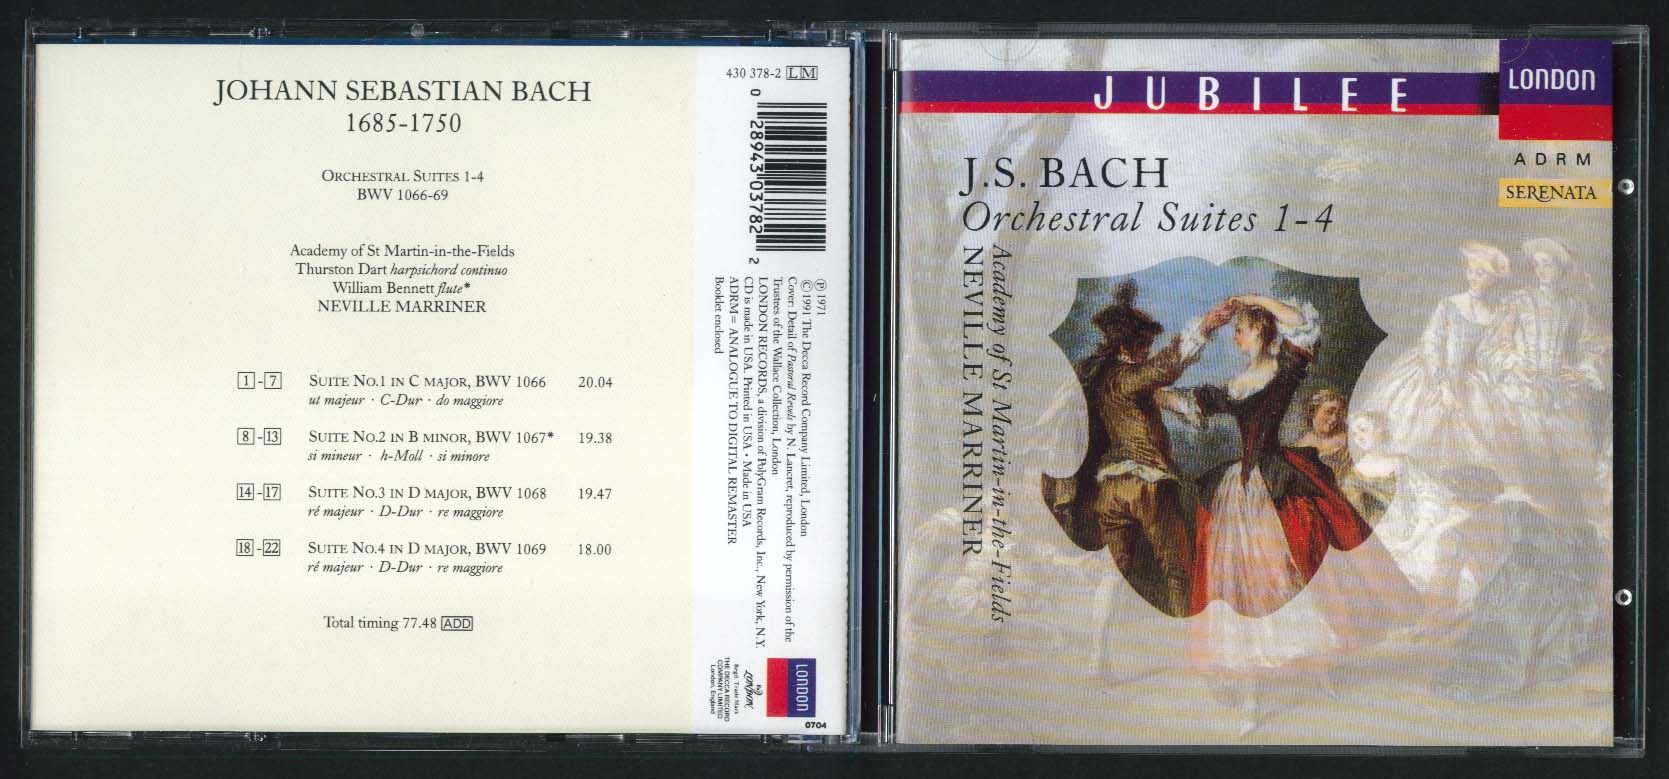 Image for Neville Marriner Bach Orchestral Suites 1-4 CD 1991